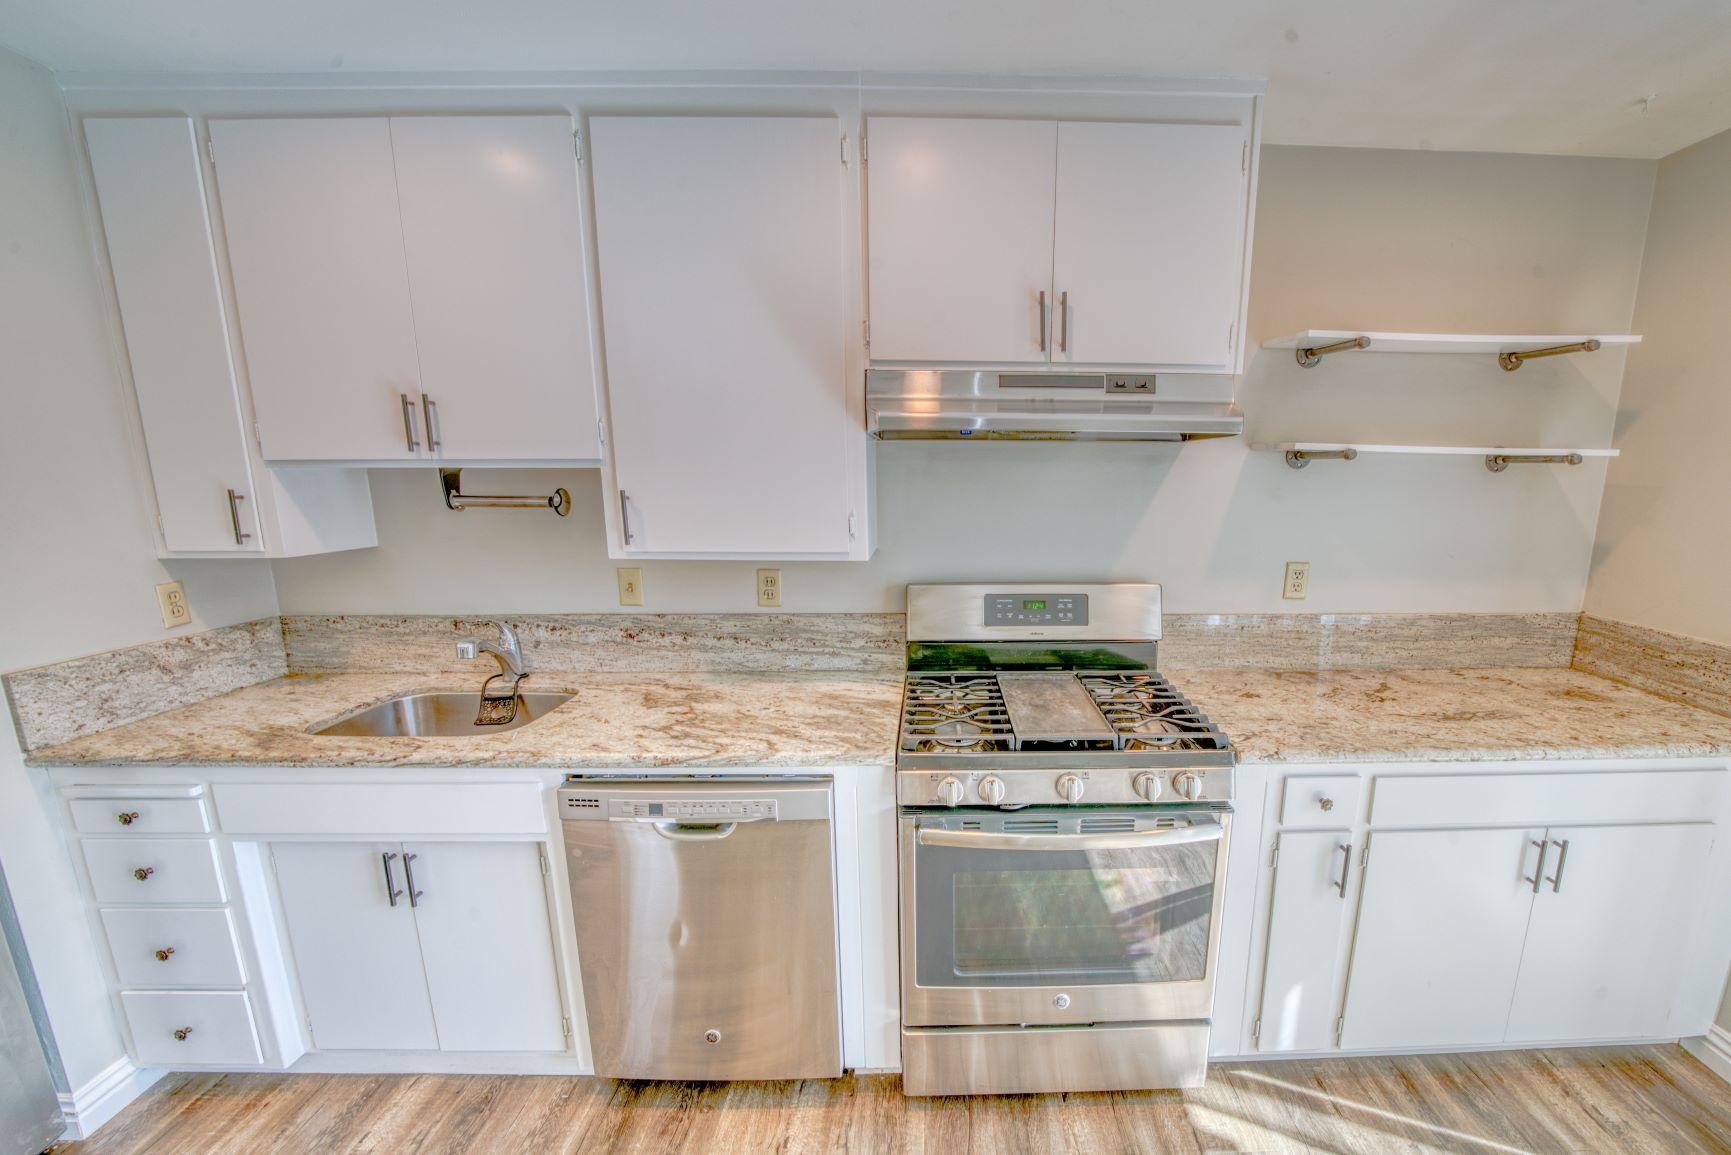 South Hills Manor Condominium Kitchen